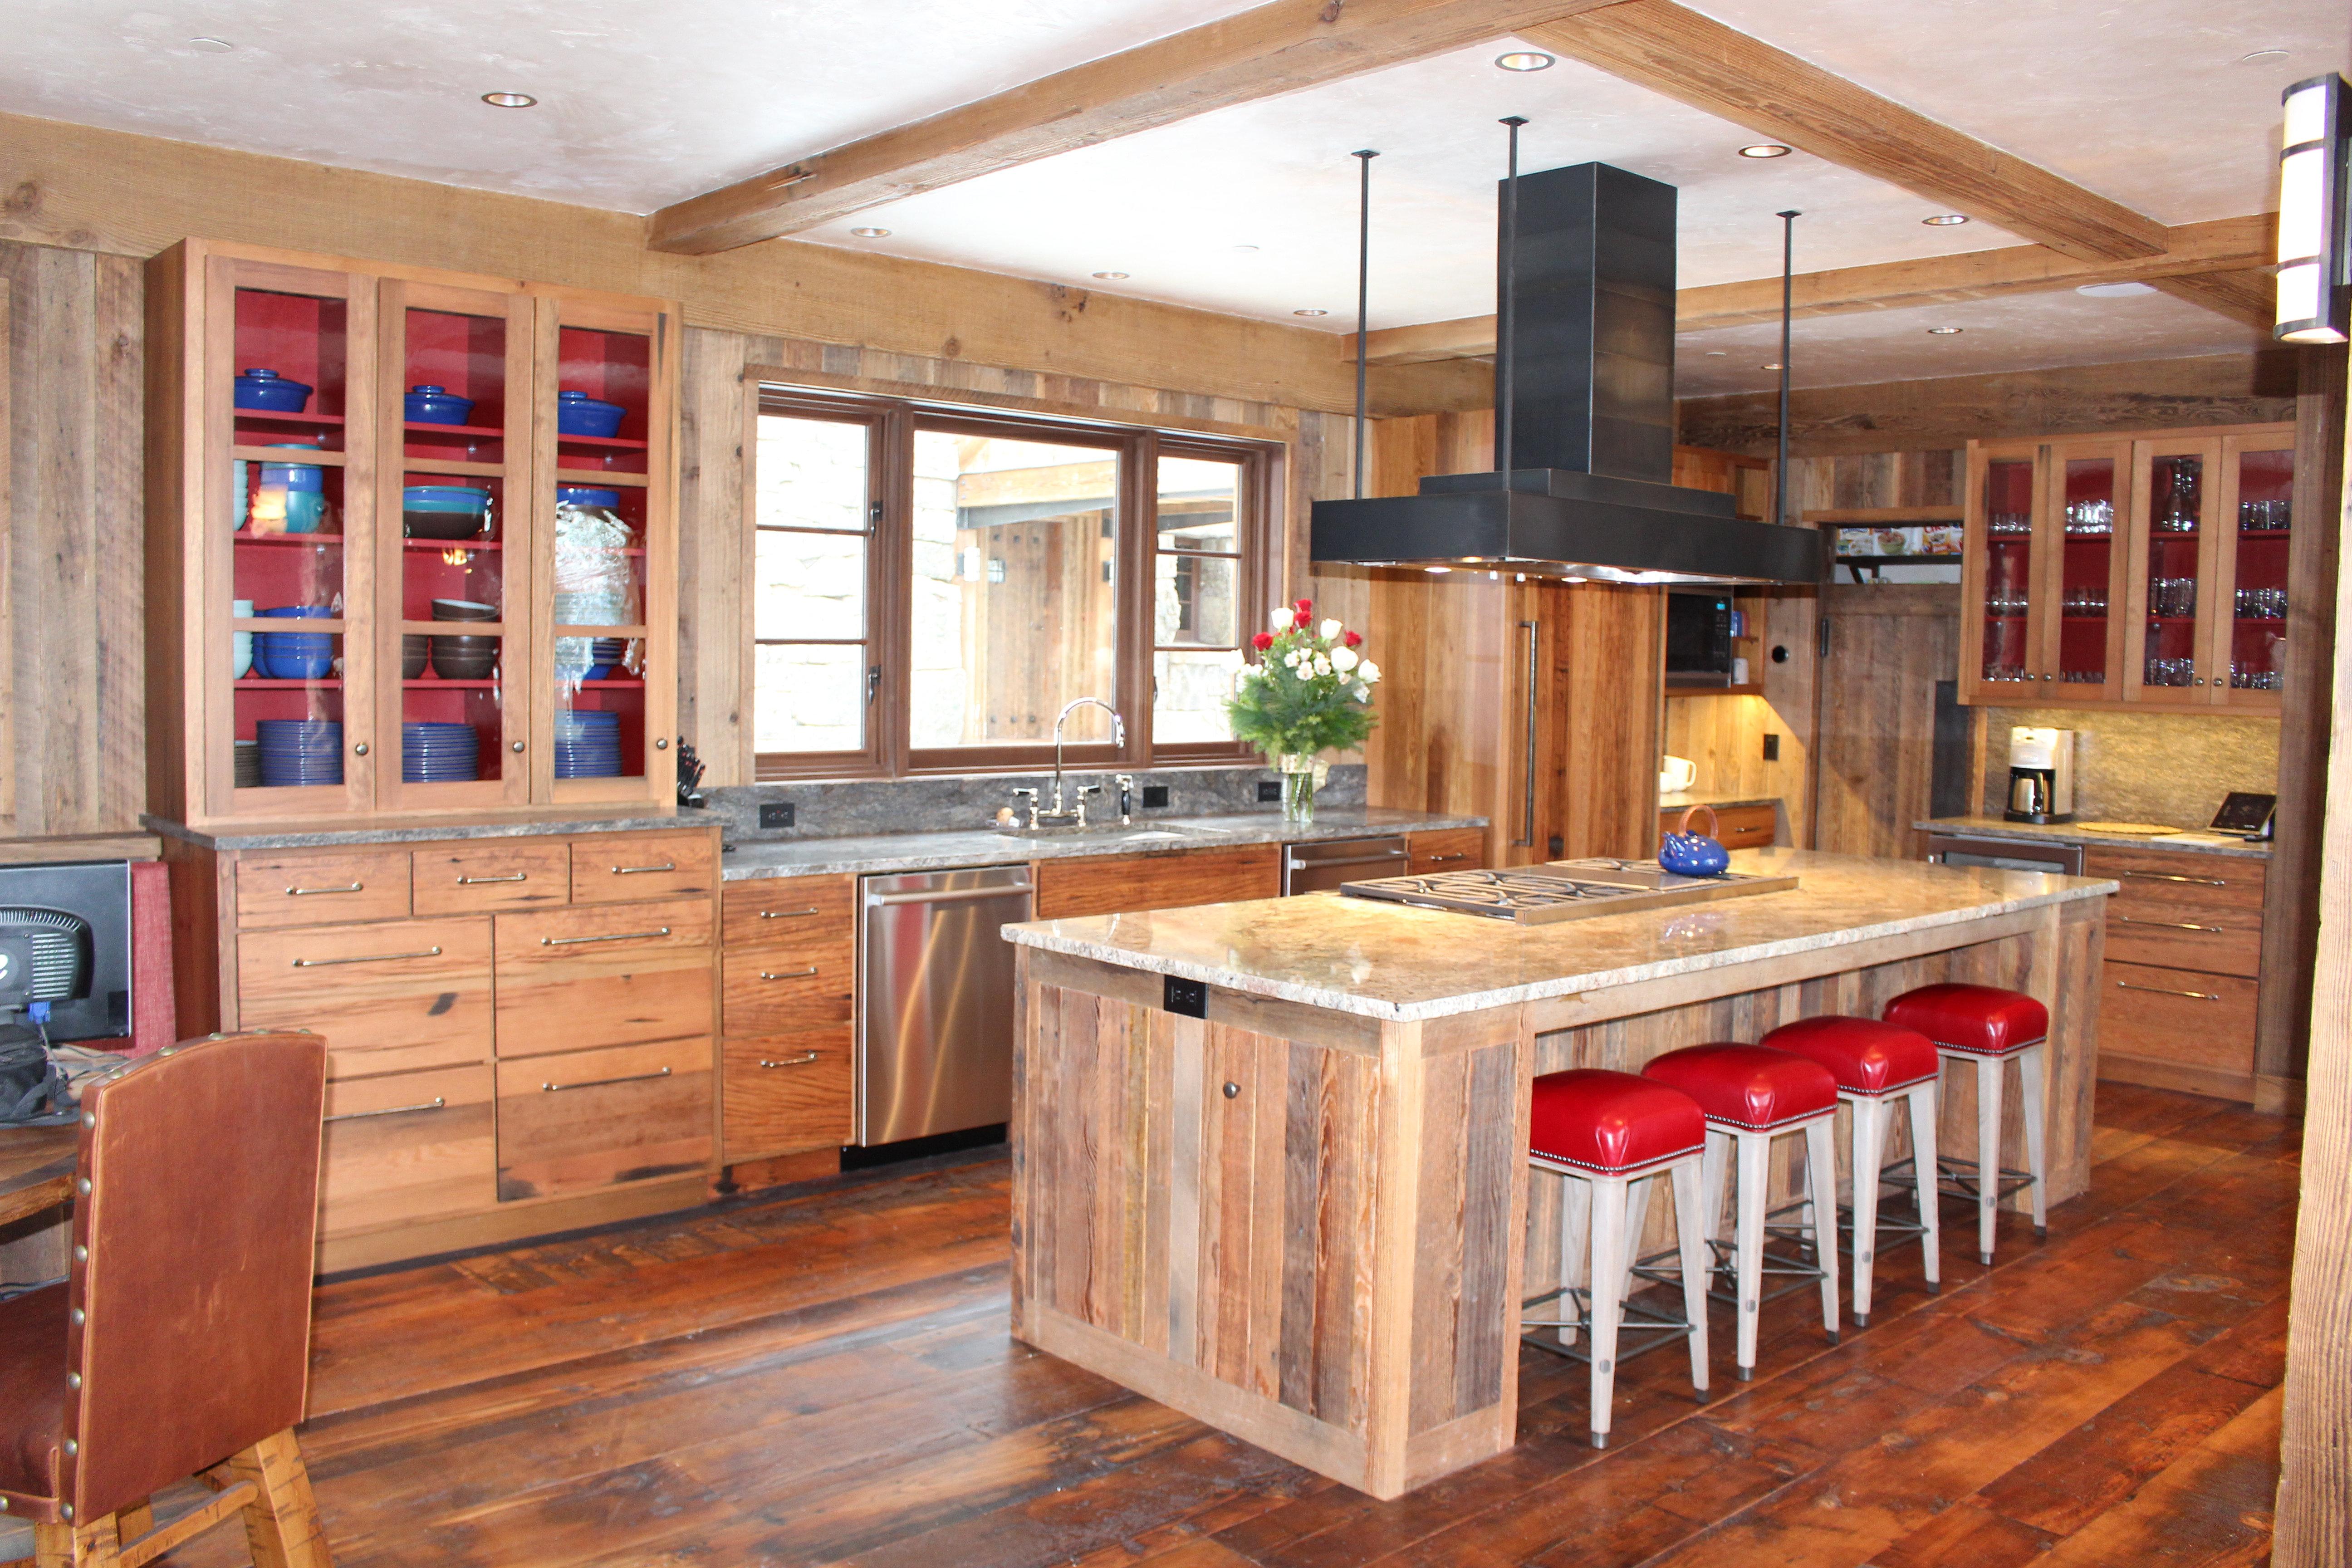 Kitchen Cabinets Jackson r palomba & company. jackson wyoming kitchen cabinets & woodwork